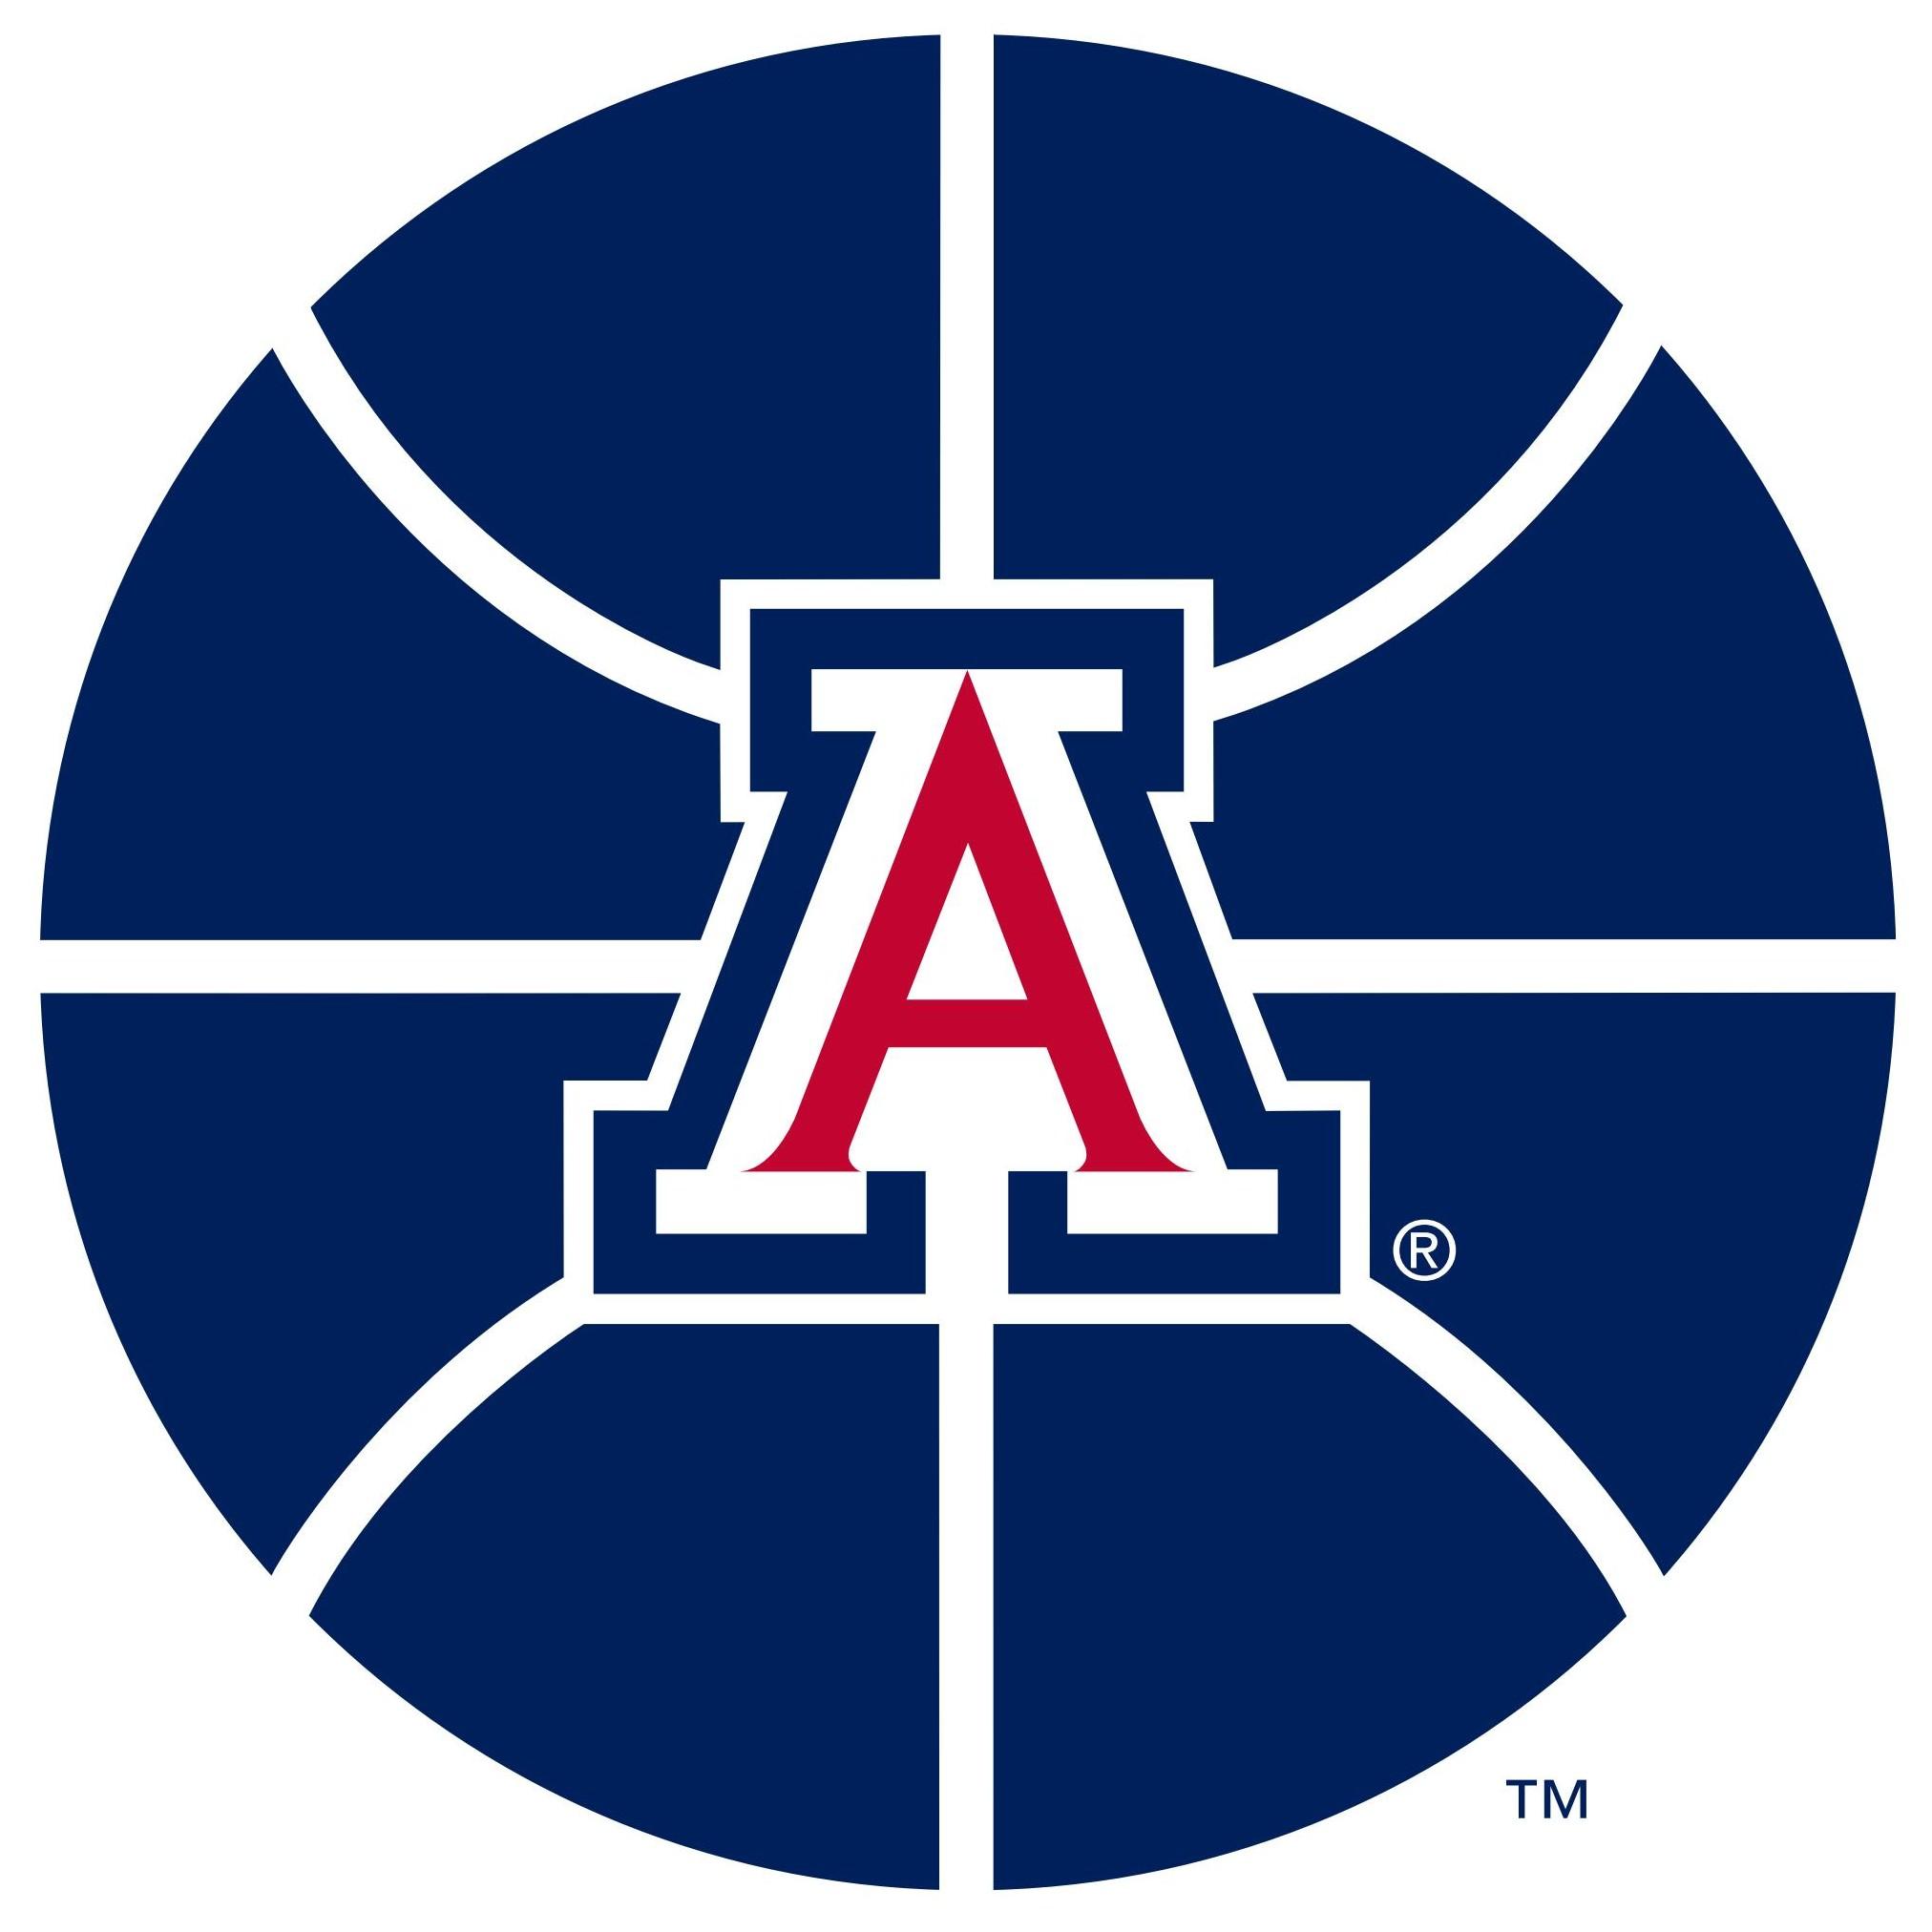 Free Arizona Wildcats Logo Png, Download Free Clip Art, Free.